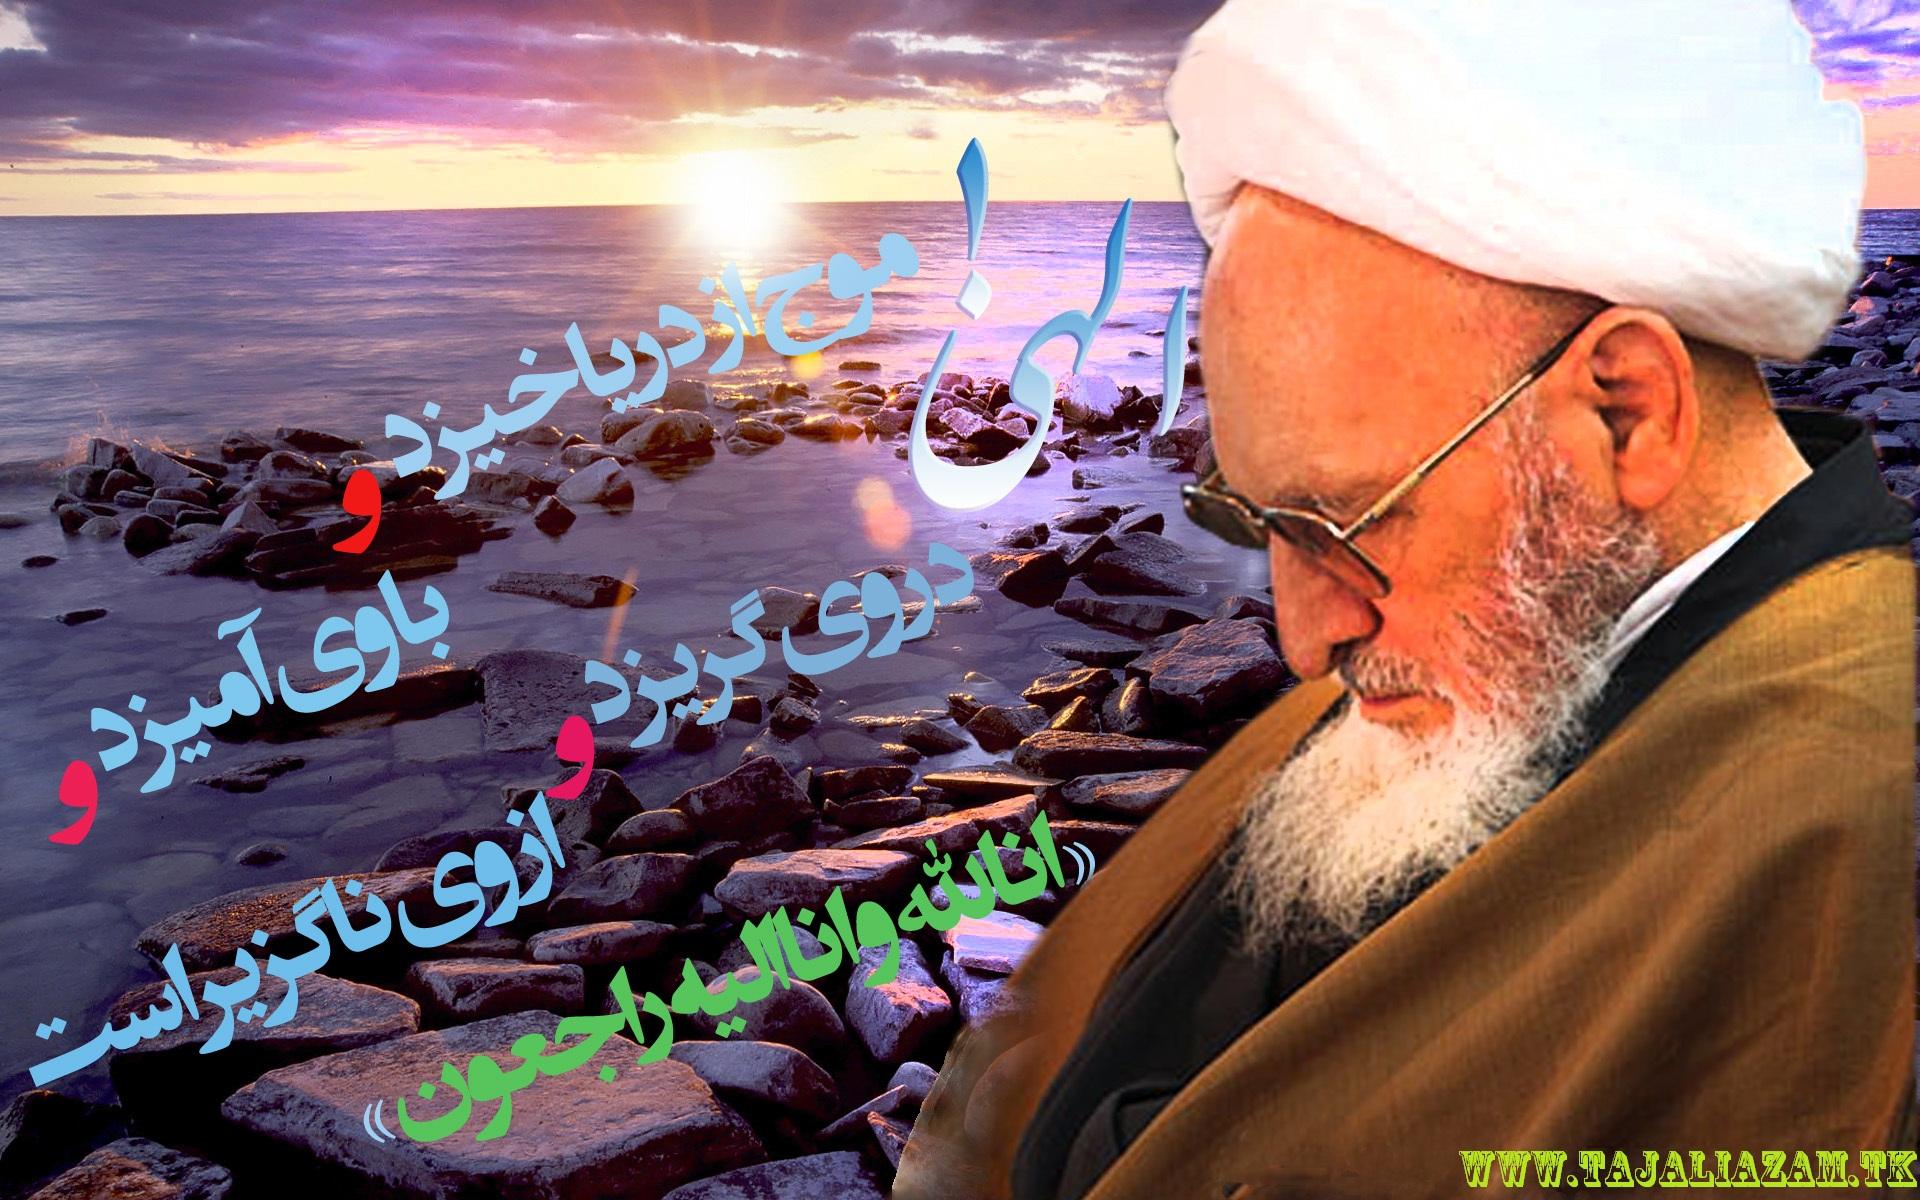 http://tajaliazam.persiangig.com/image/348.jpg